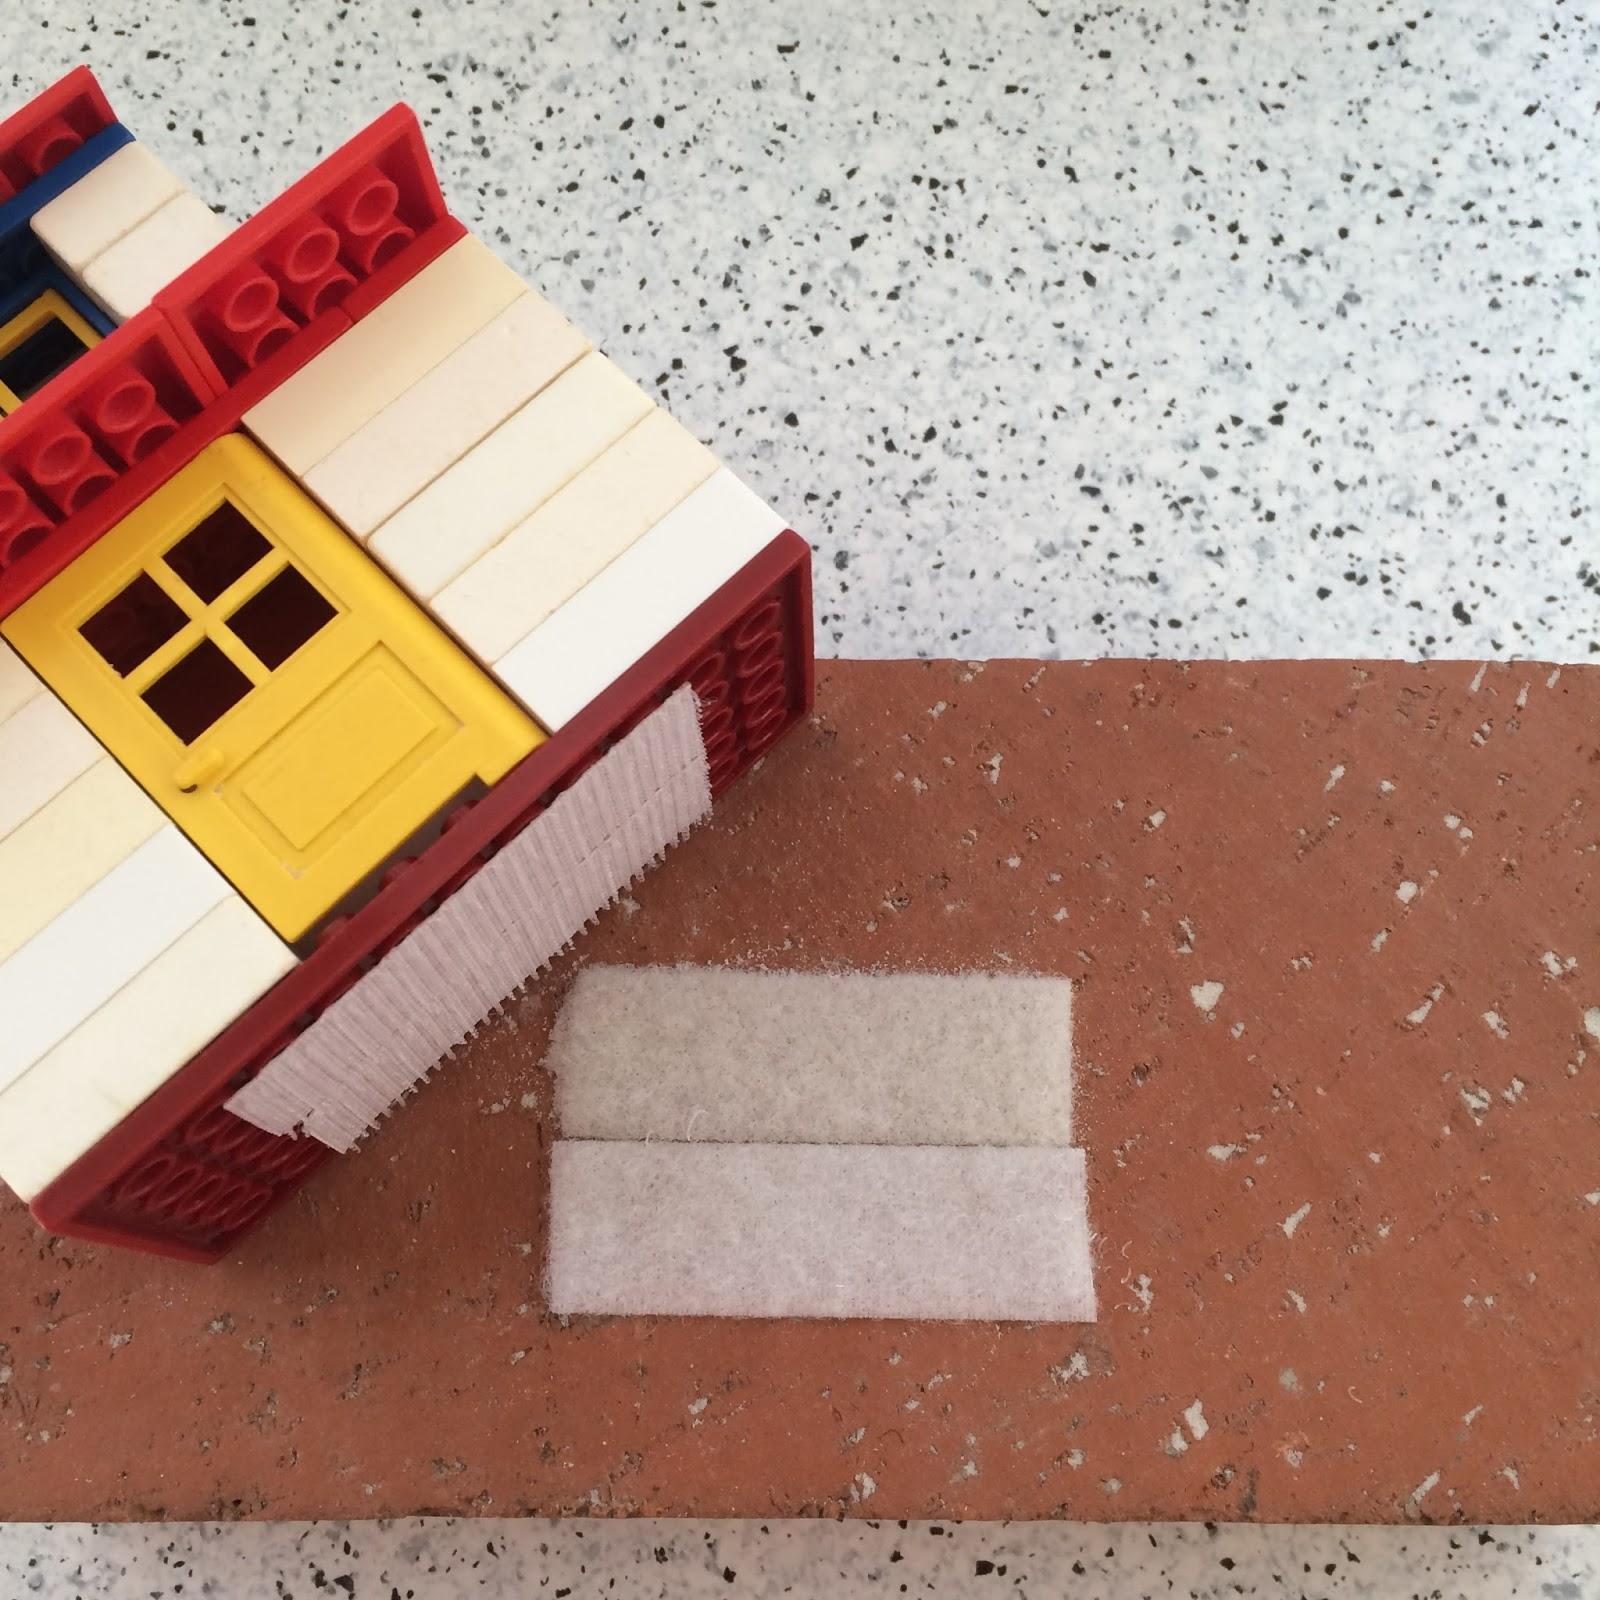 Wise man built his house upon the rock sermon - Teach